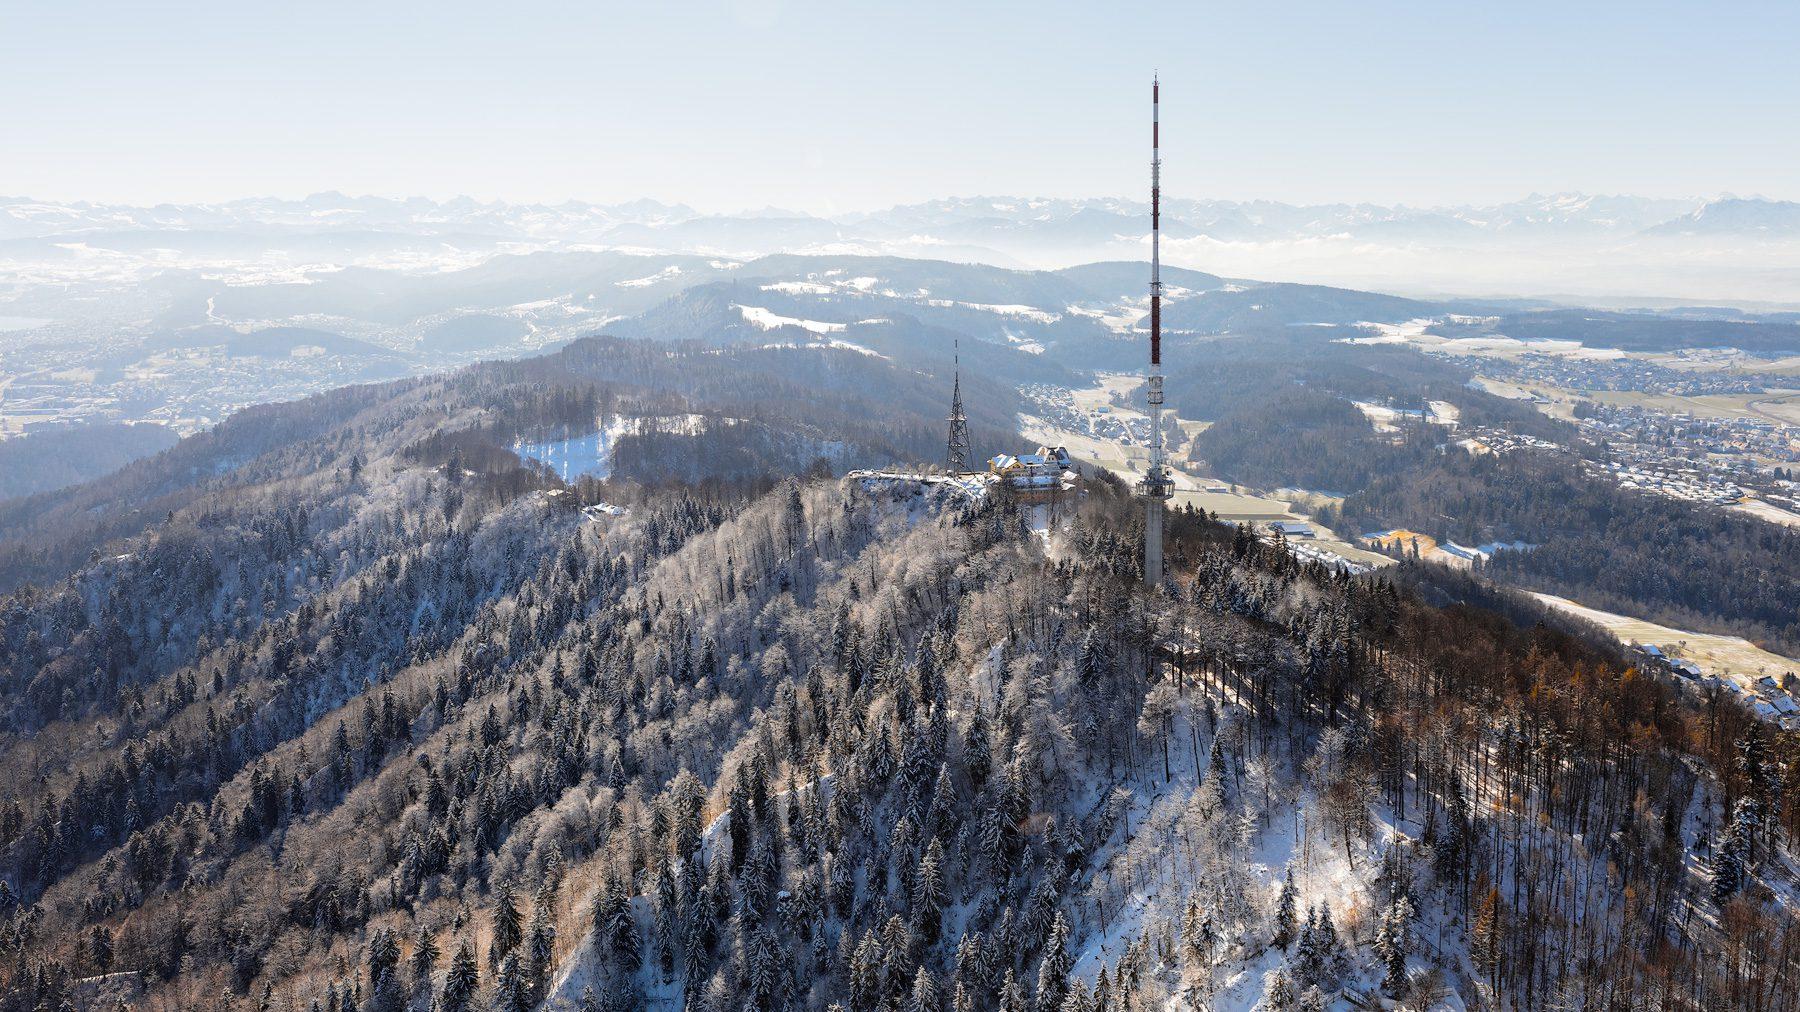 Luftaufnahme Uetliberg / Uto Kulm - Knonaueramt, Glarneralpen